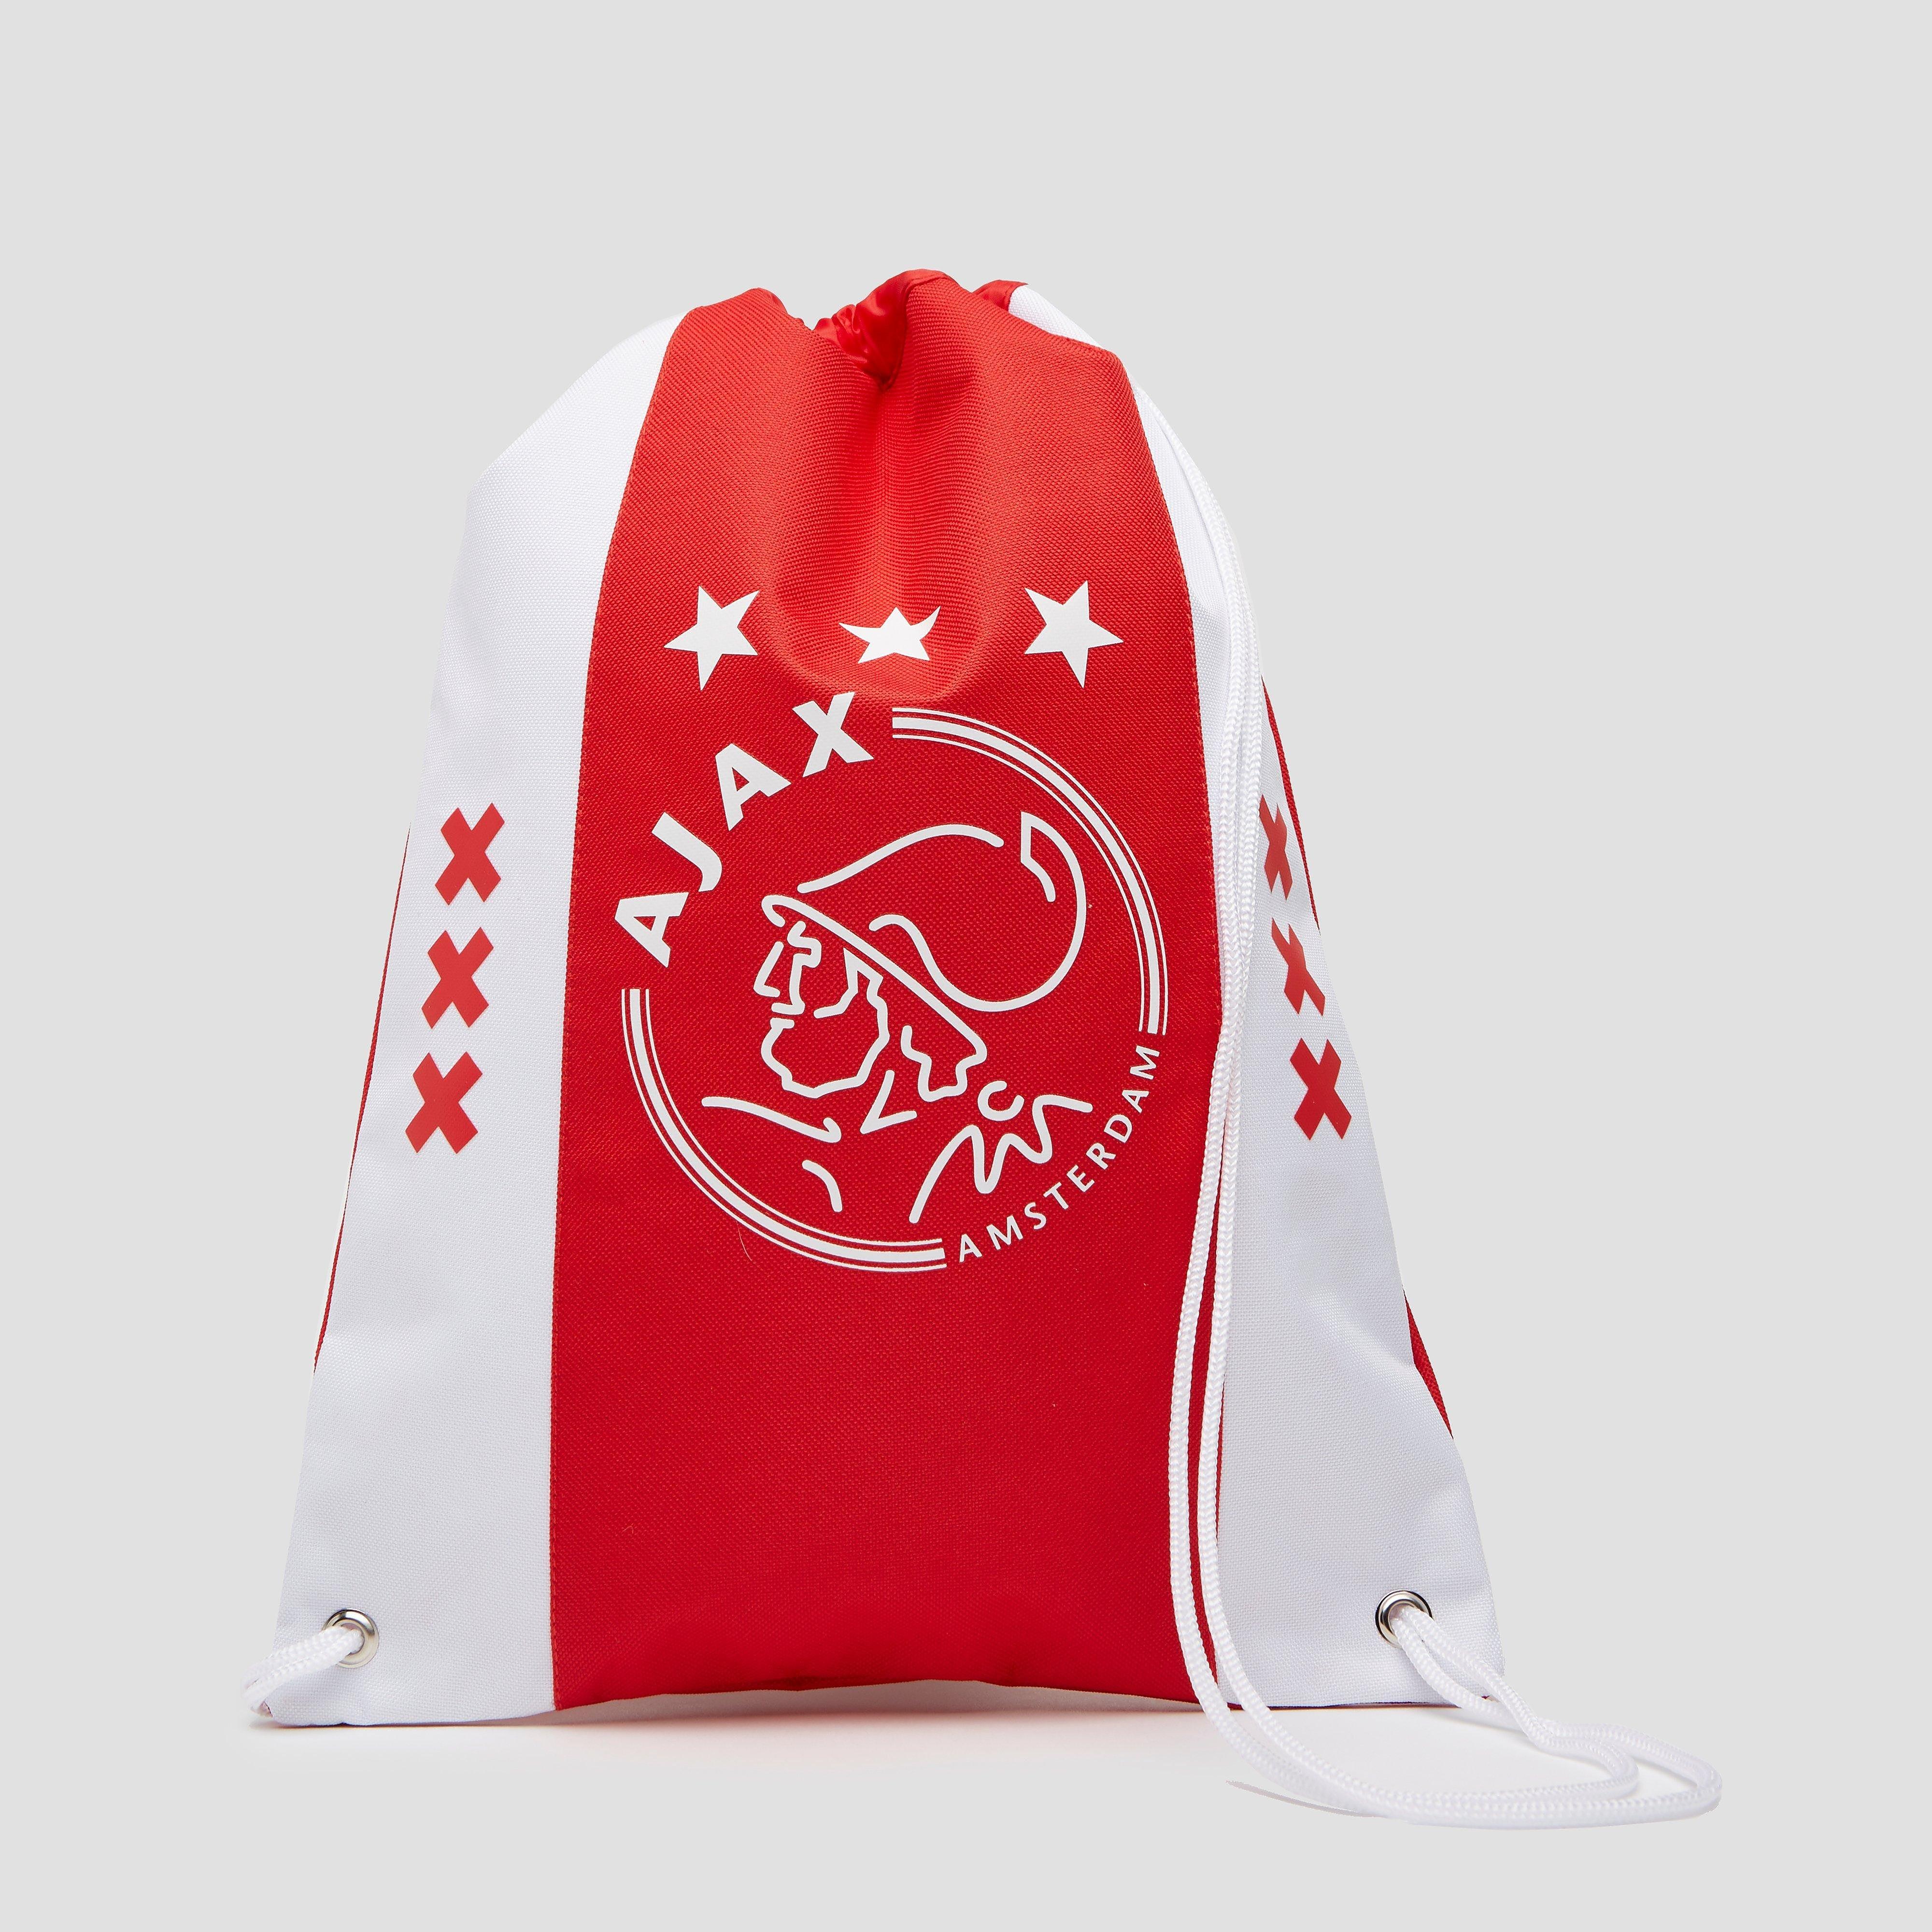 AJAX Afc ajax gymtas 19/20 wit/rood Kinderen